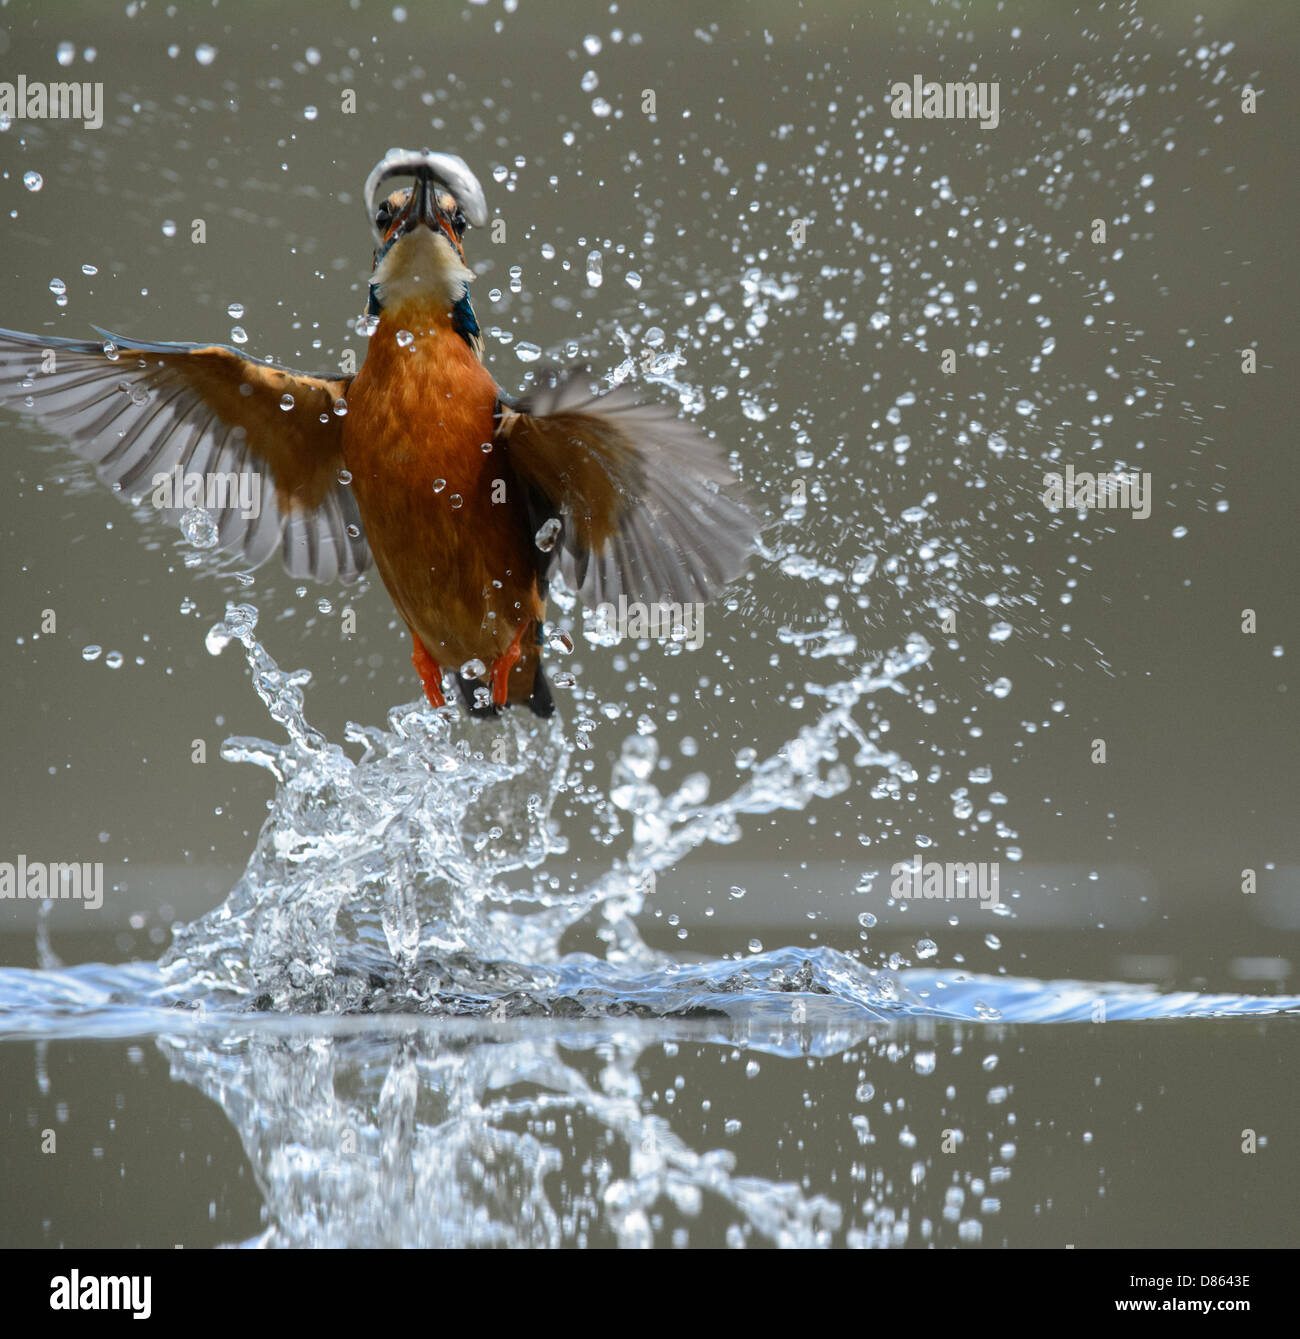 Immersioni subacquee kingfisher Immagini Stock